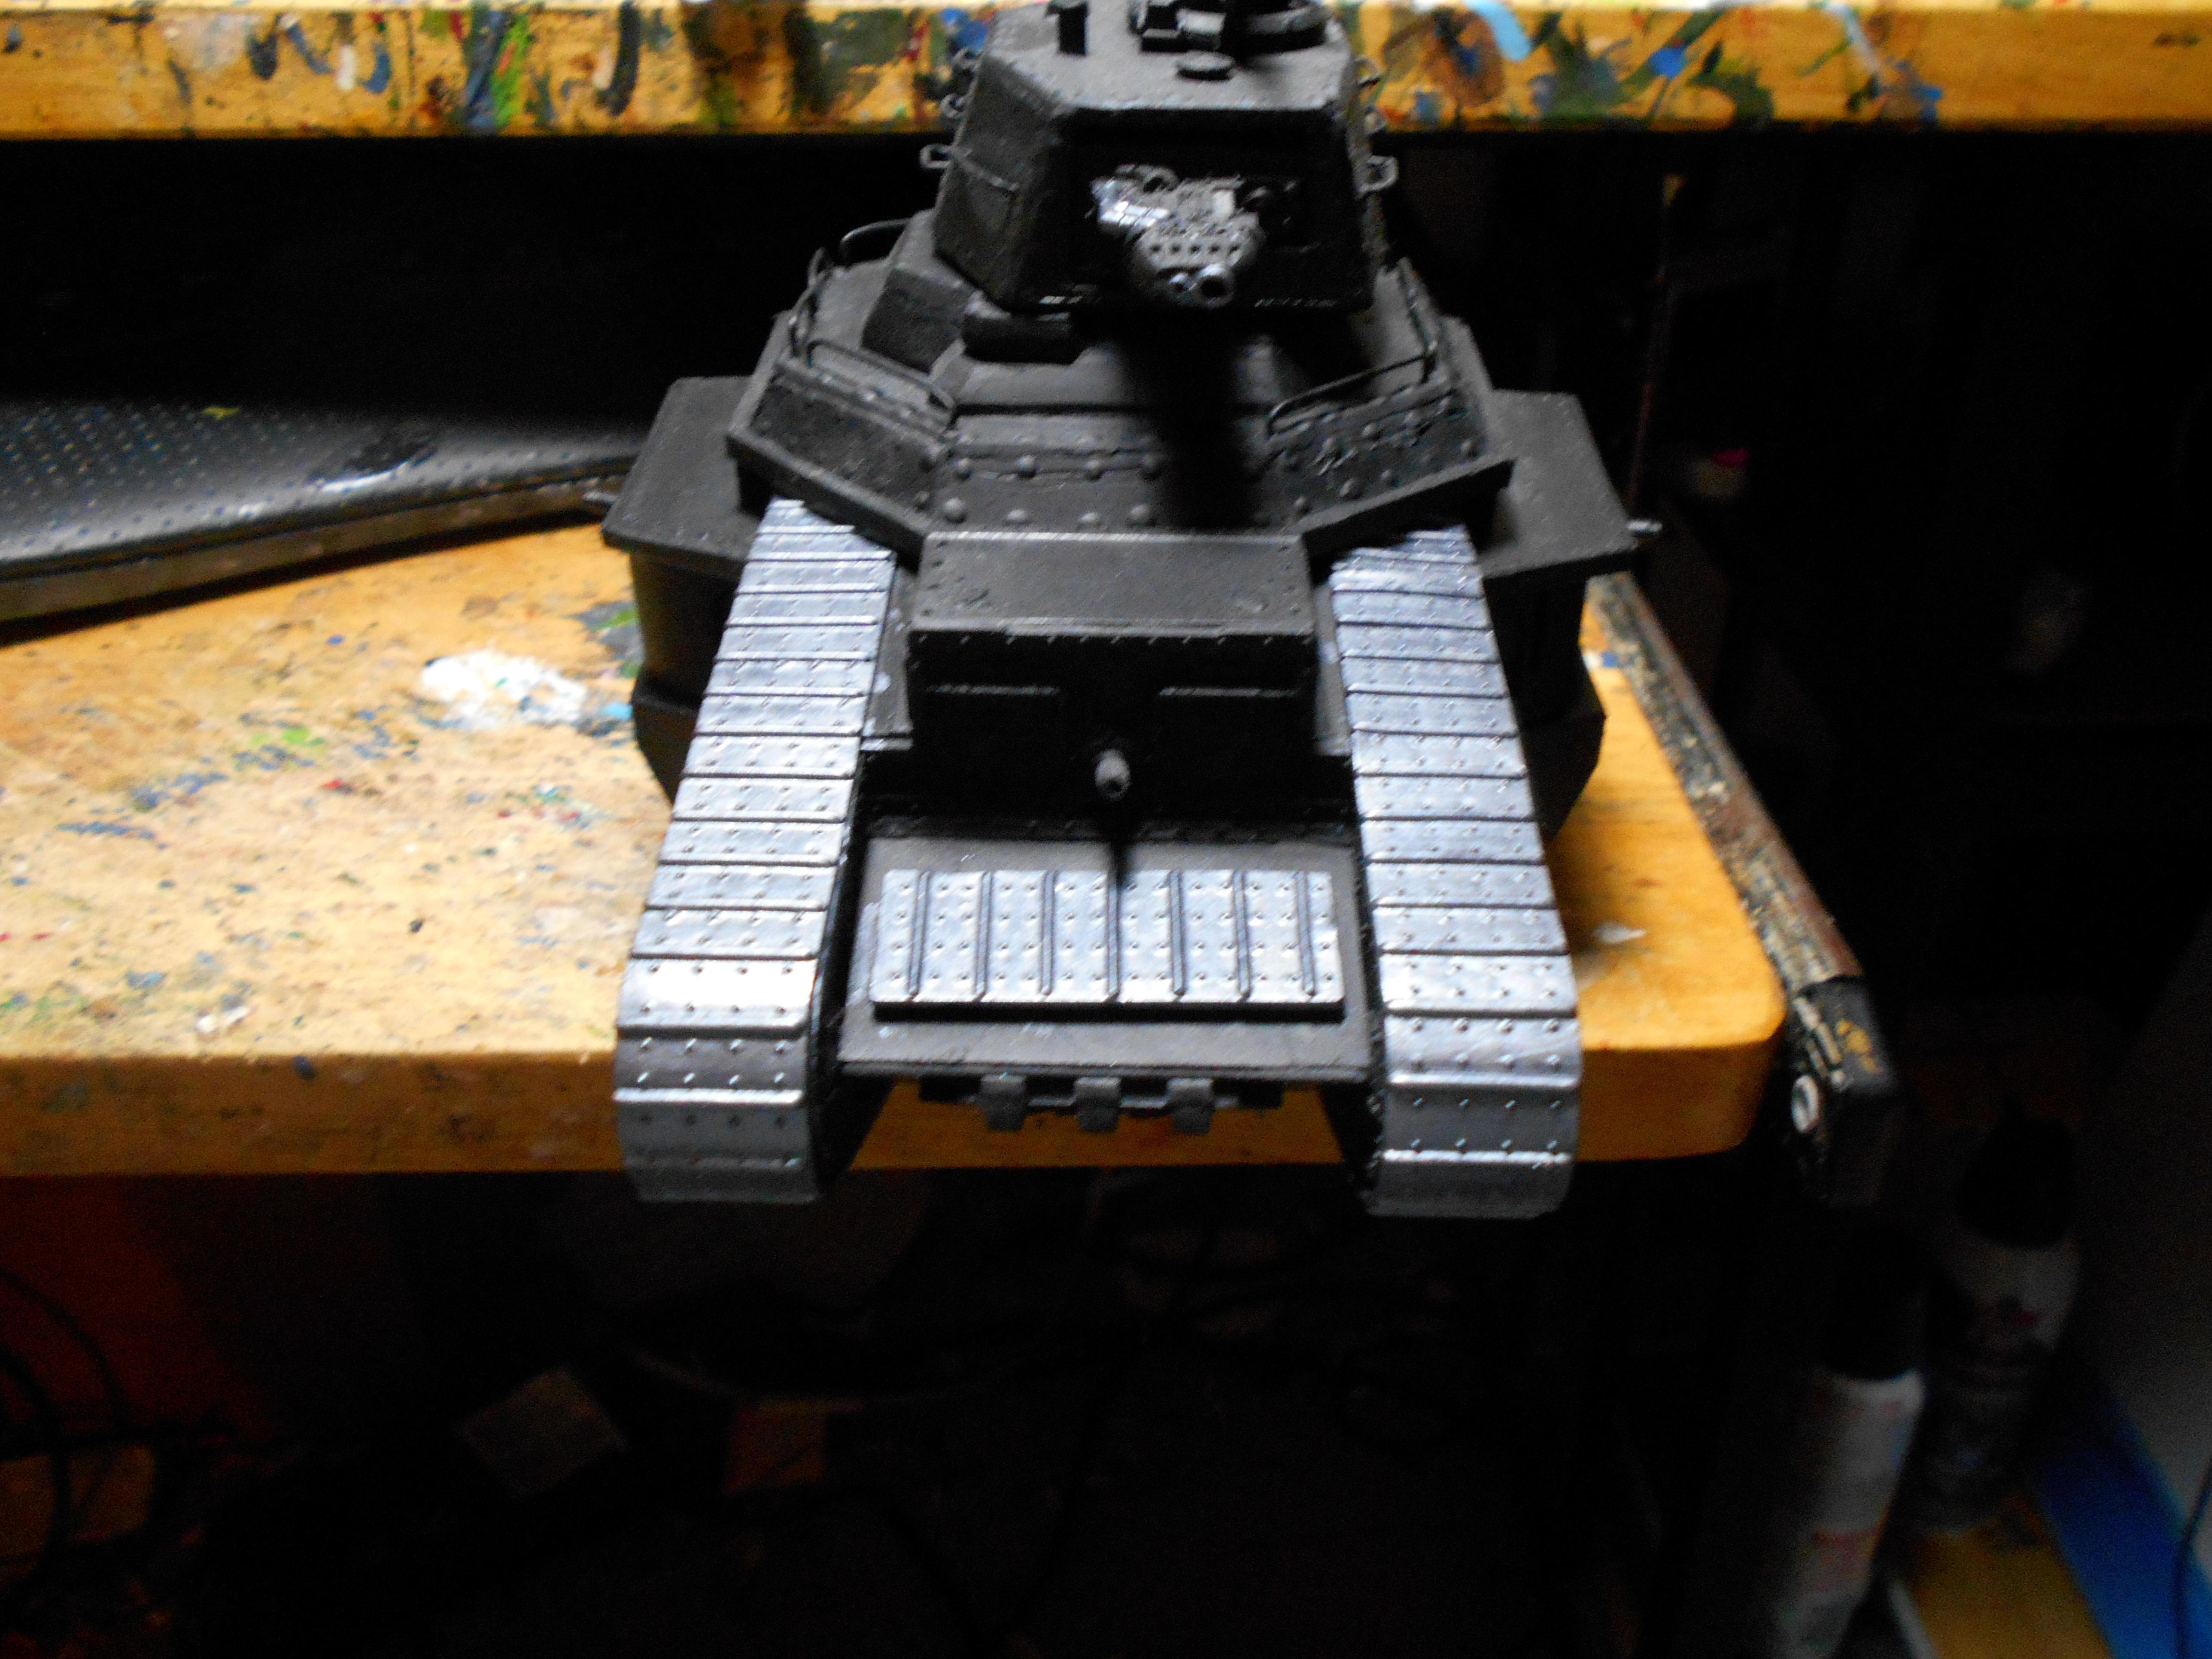 Armor, Astra Militum, Conversion, Imperial Guard, Scratch Build, Tank, Warhammer 40,000, Warhammer Fantasy